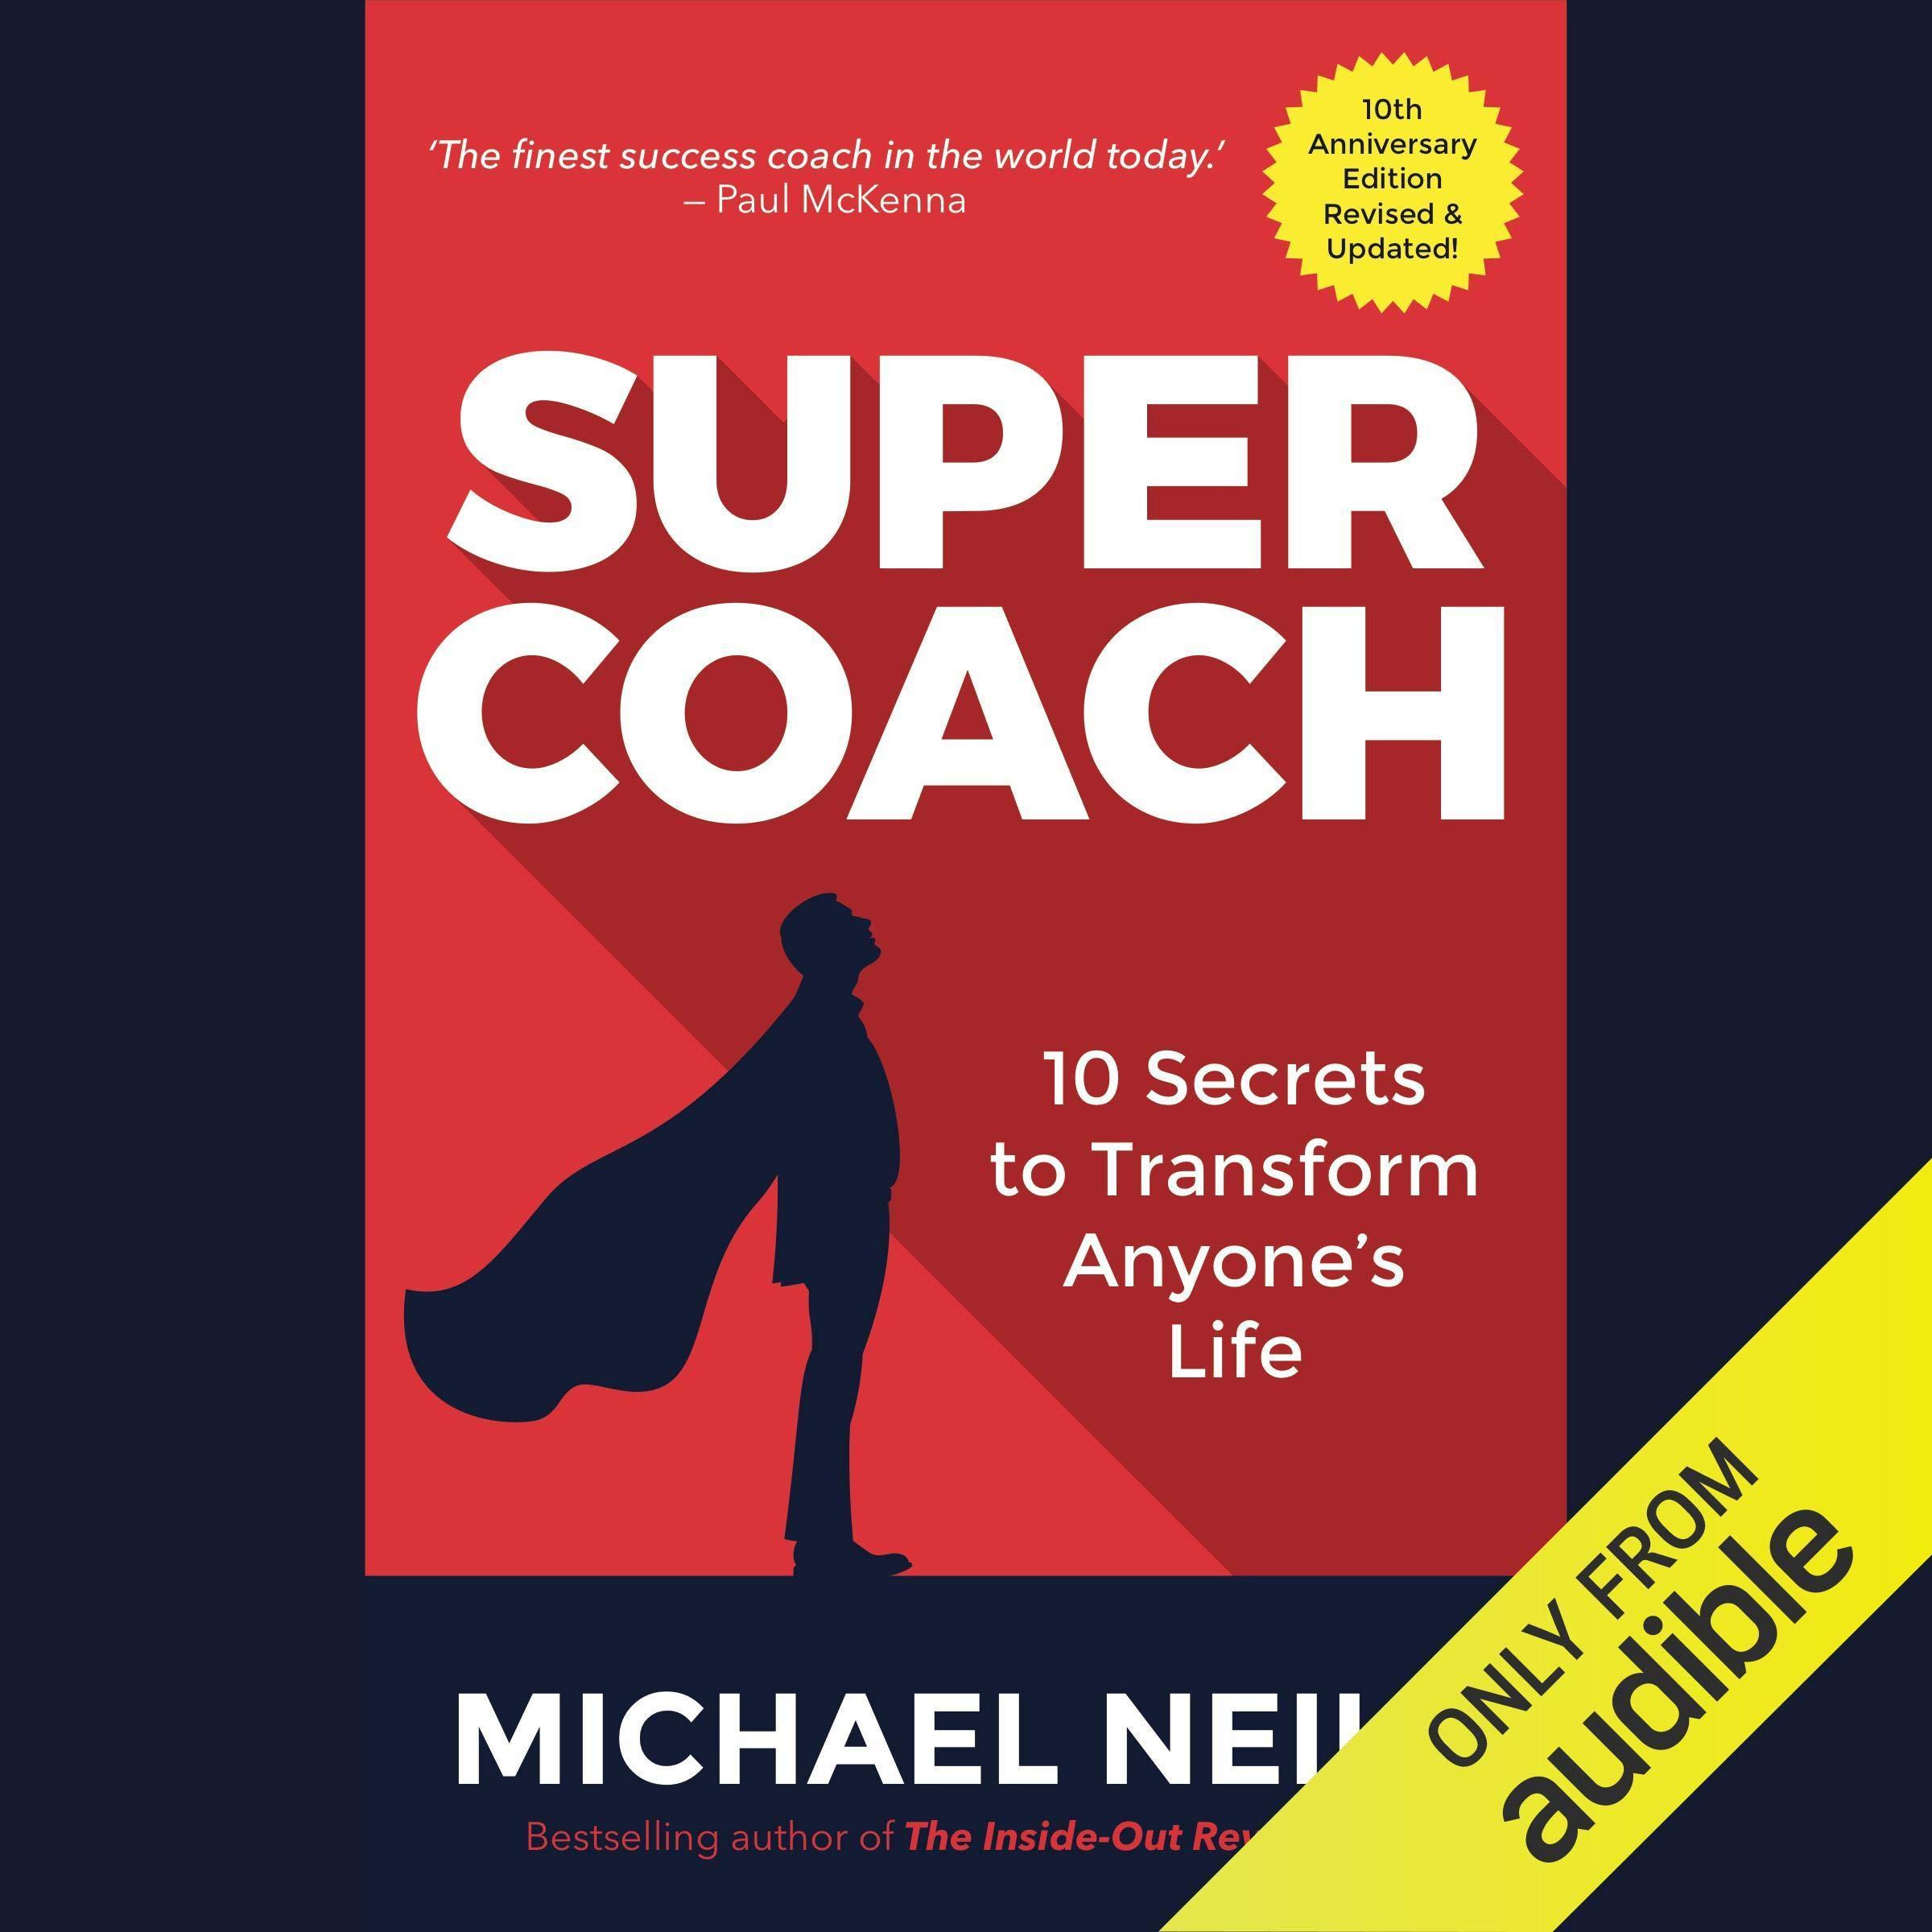 Supercoach: 10th Anniversary Edition: 10 Secrets to Transform Anyone's Life